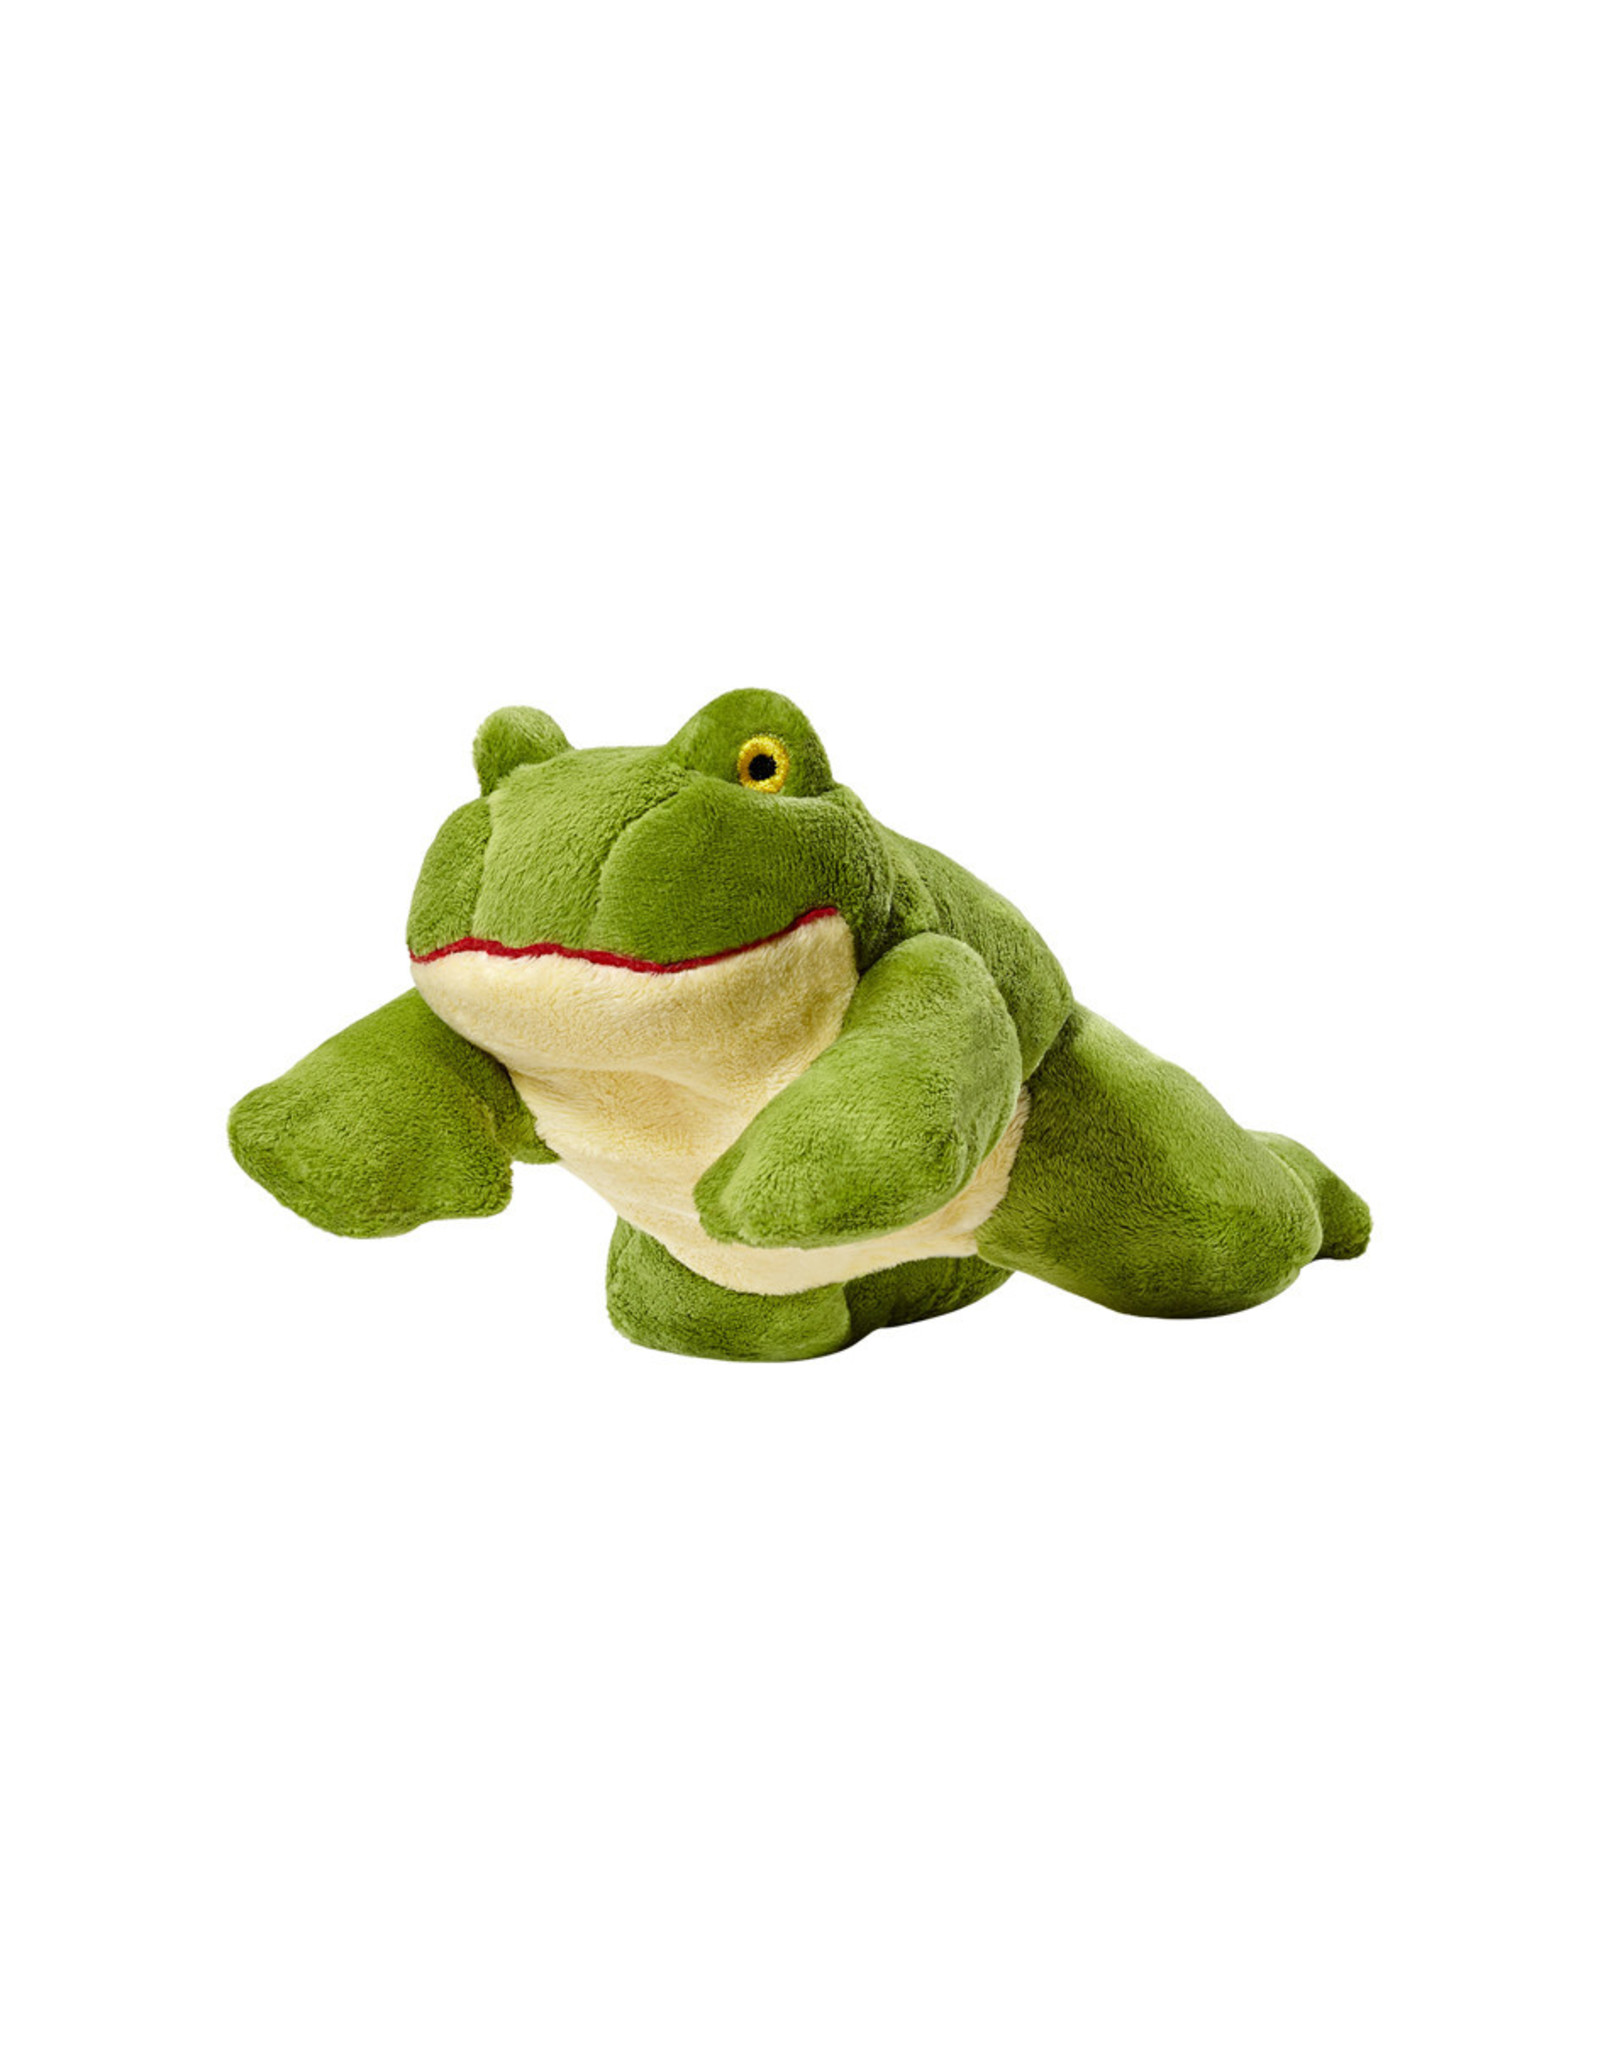 Fluff & Tuff Fluff & Tuff: Olive Frog, S